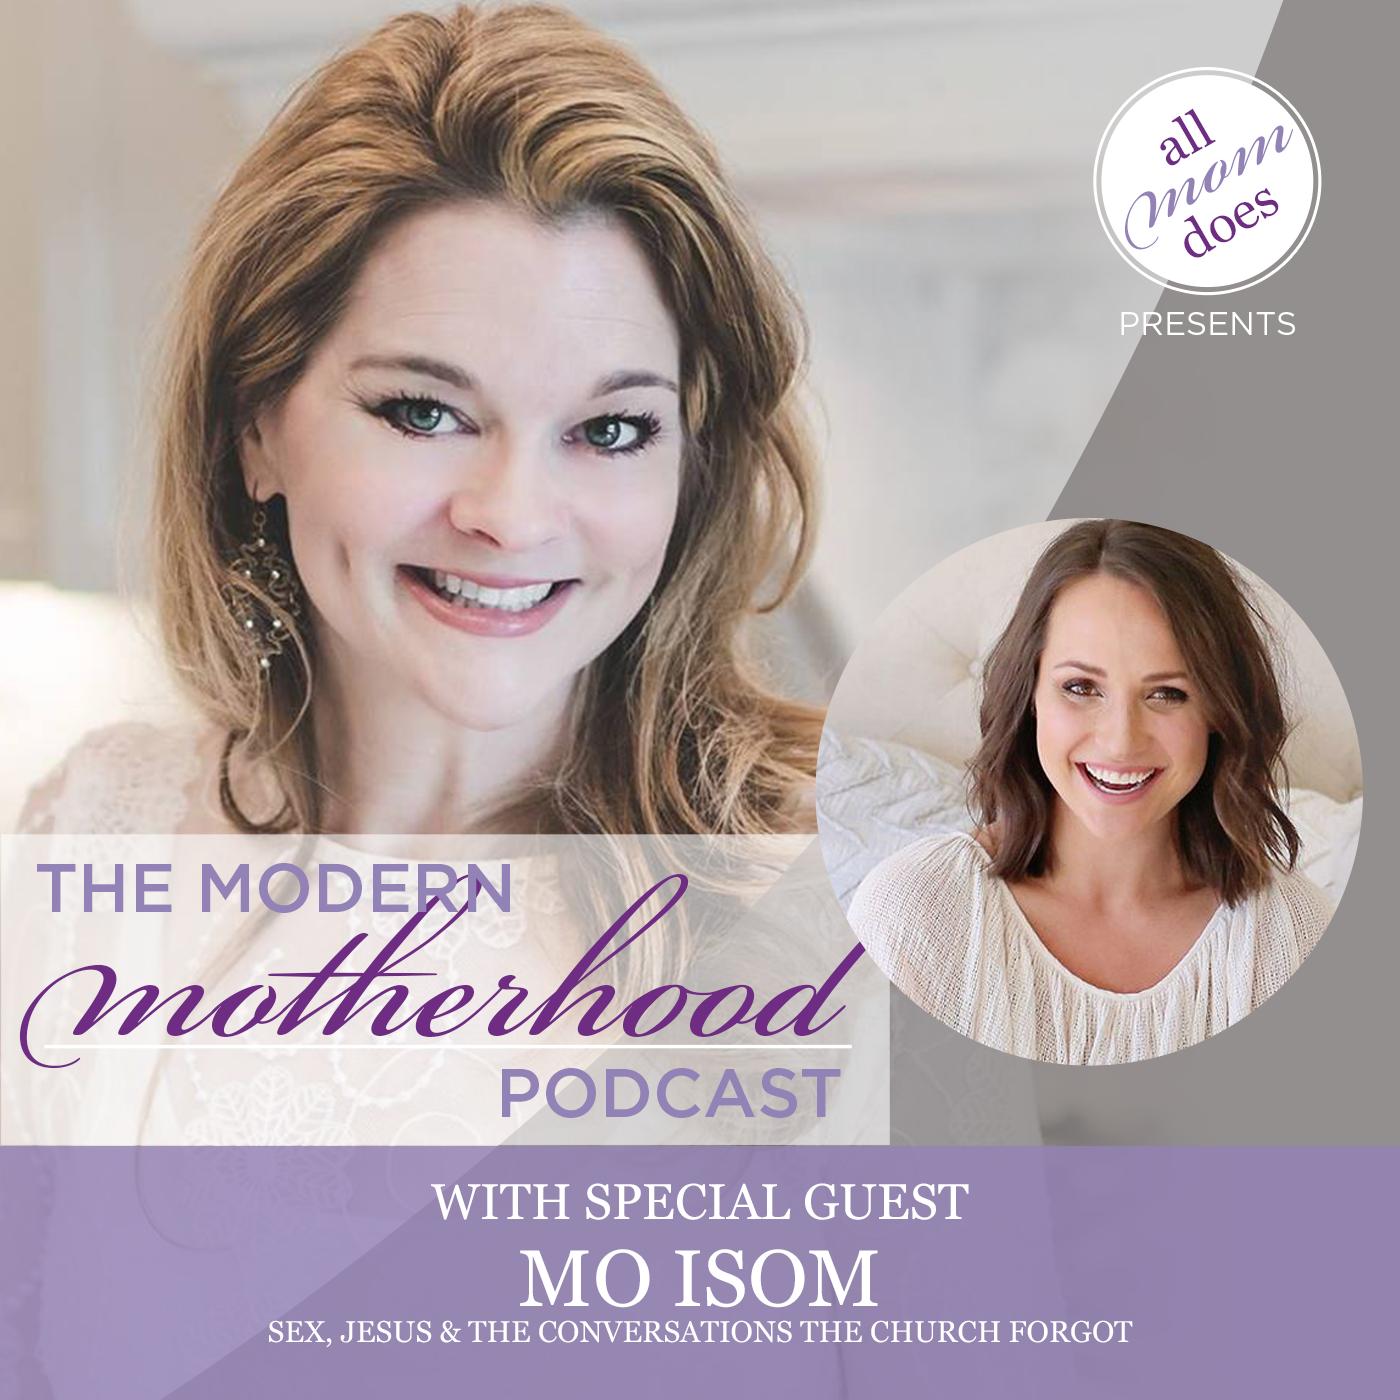 The Modern Motherhood Podcast #17: Mo Isom